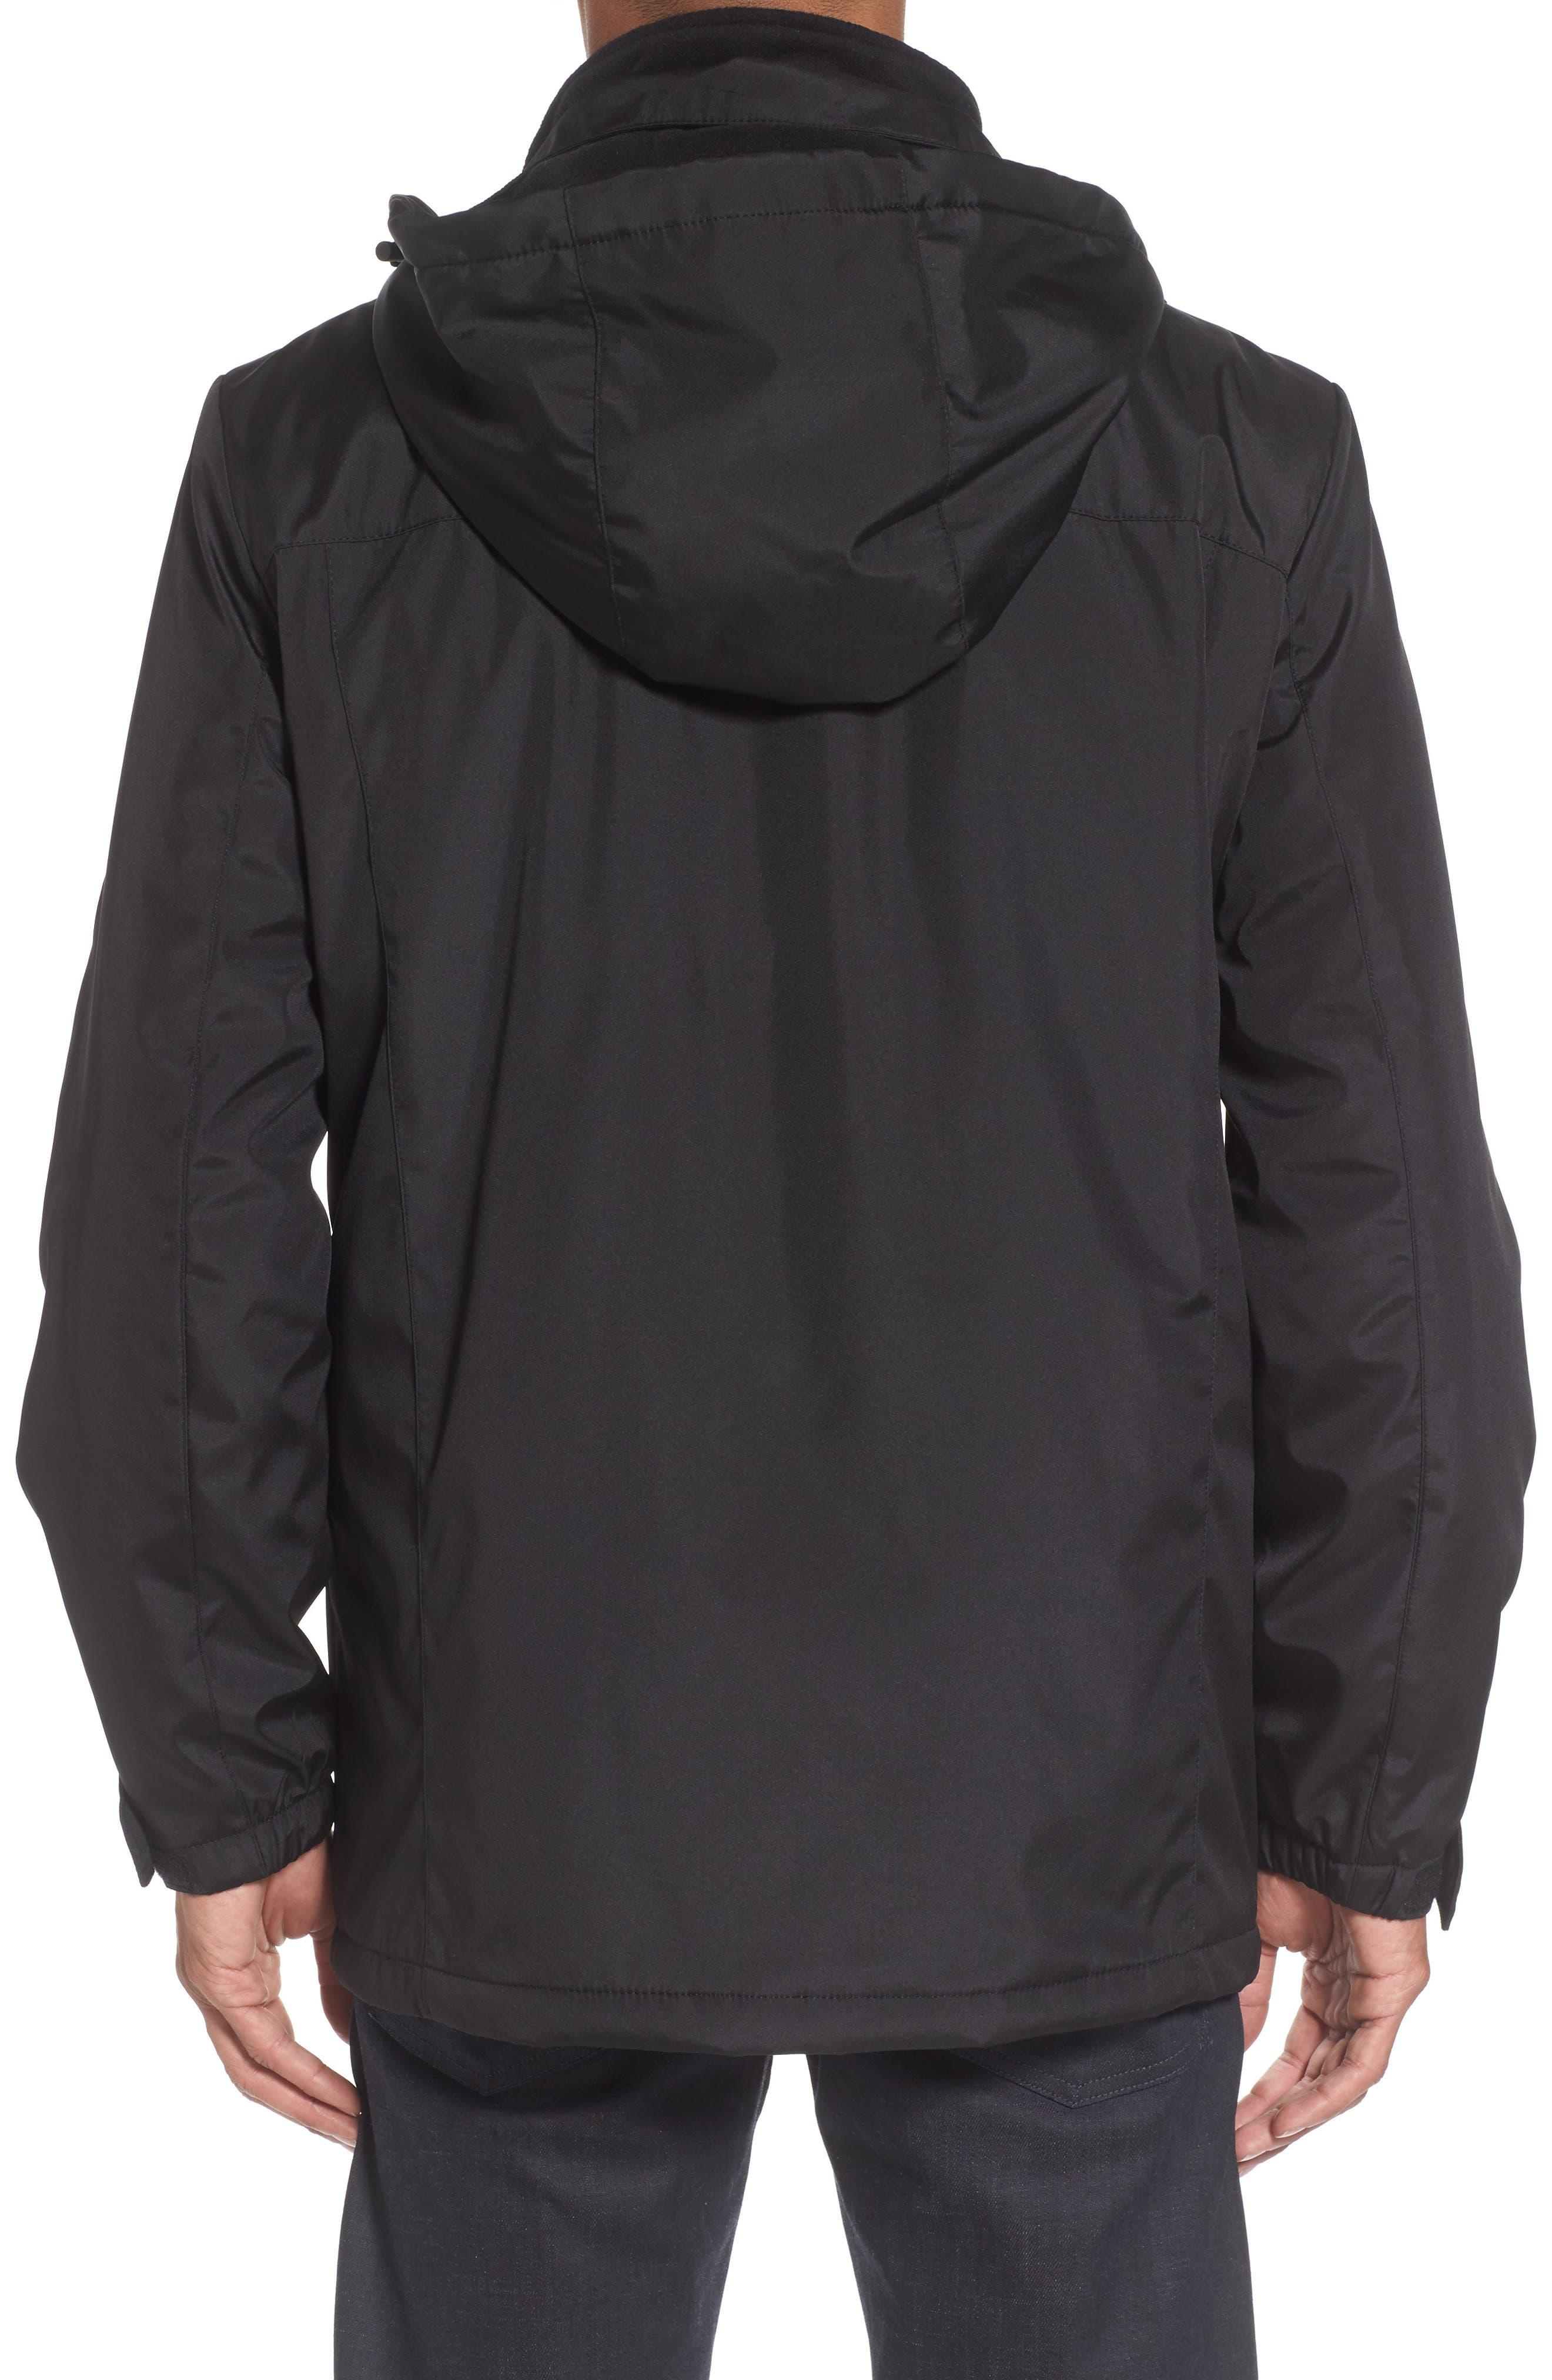 Hooded Jacket with Inset Fleece Bib,                             Alternate thumbnail 2, color,                             001